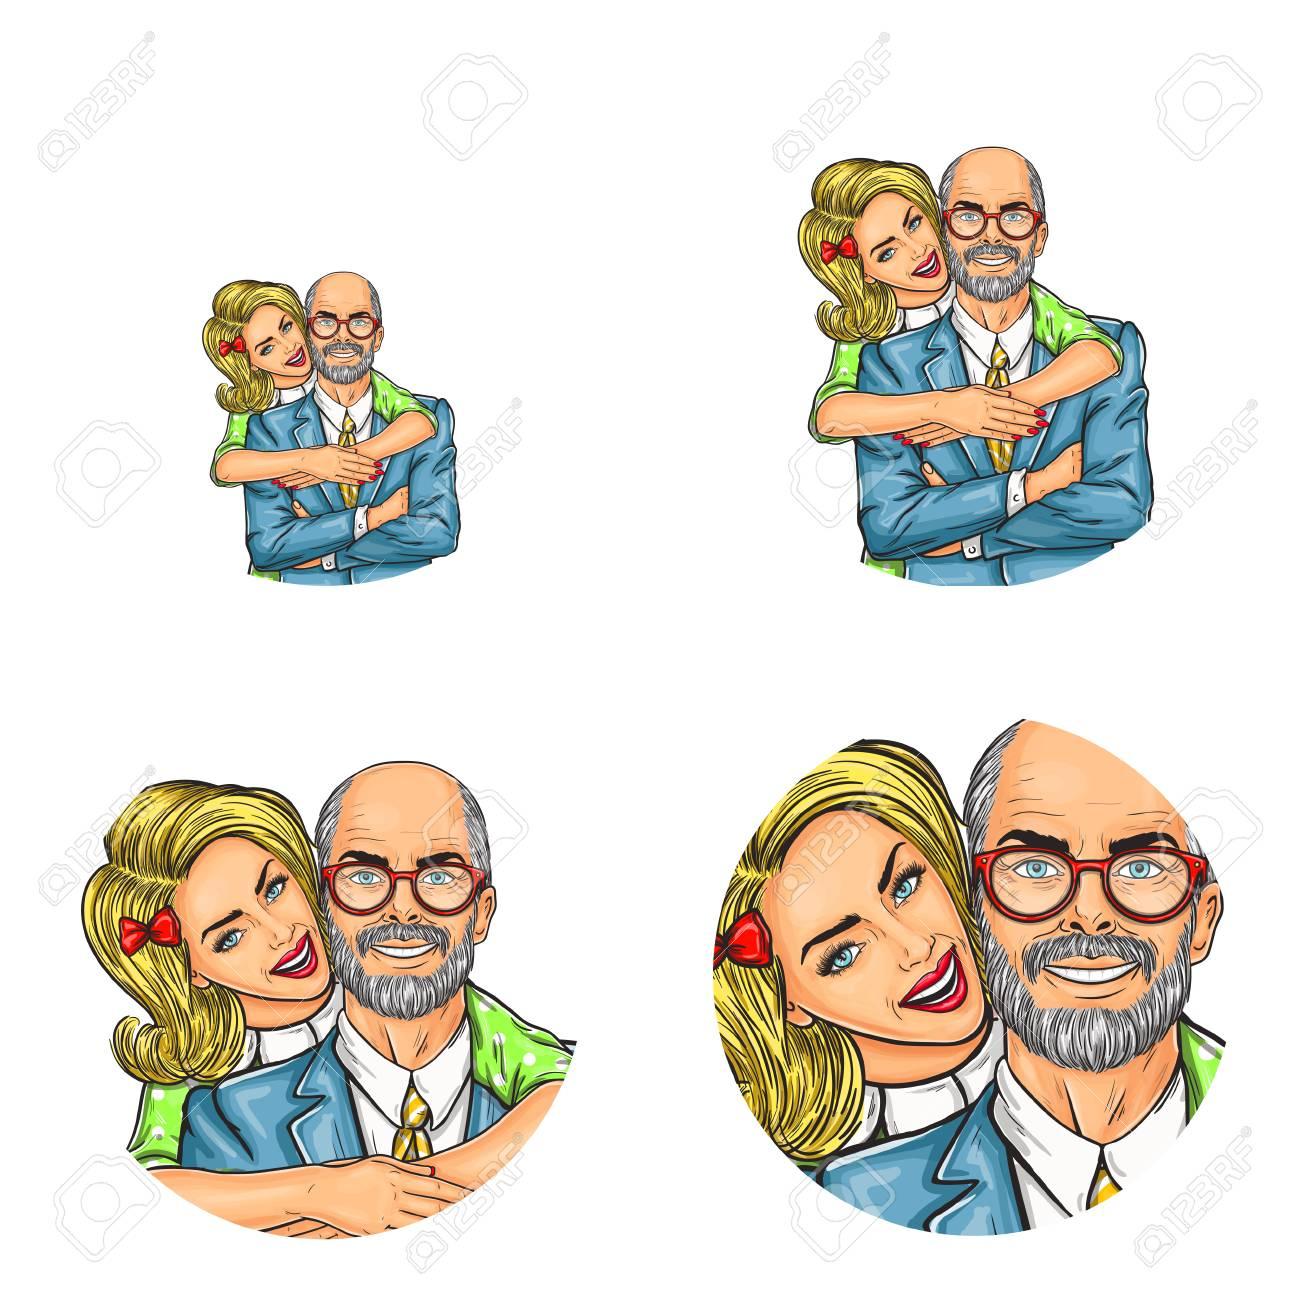 vector pop art avatars for social network chat user profile or